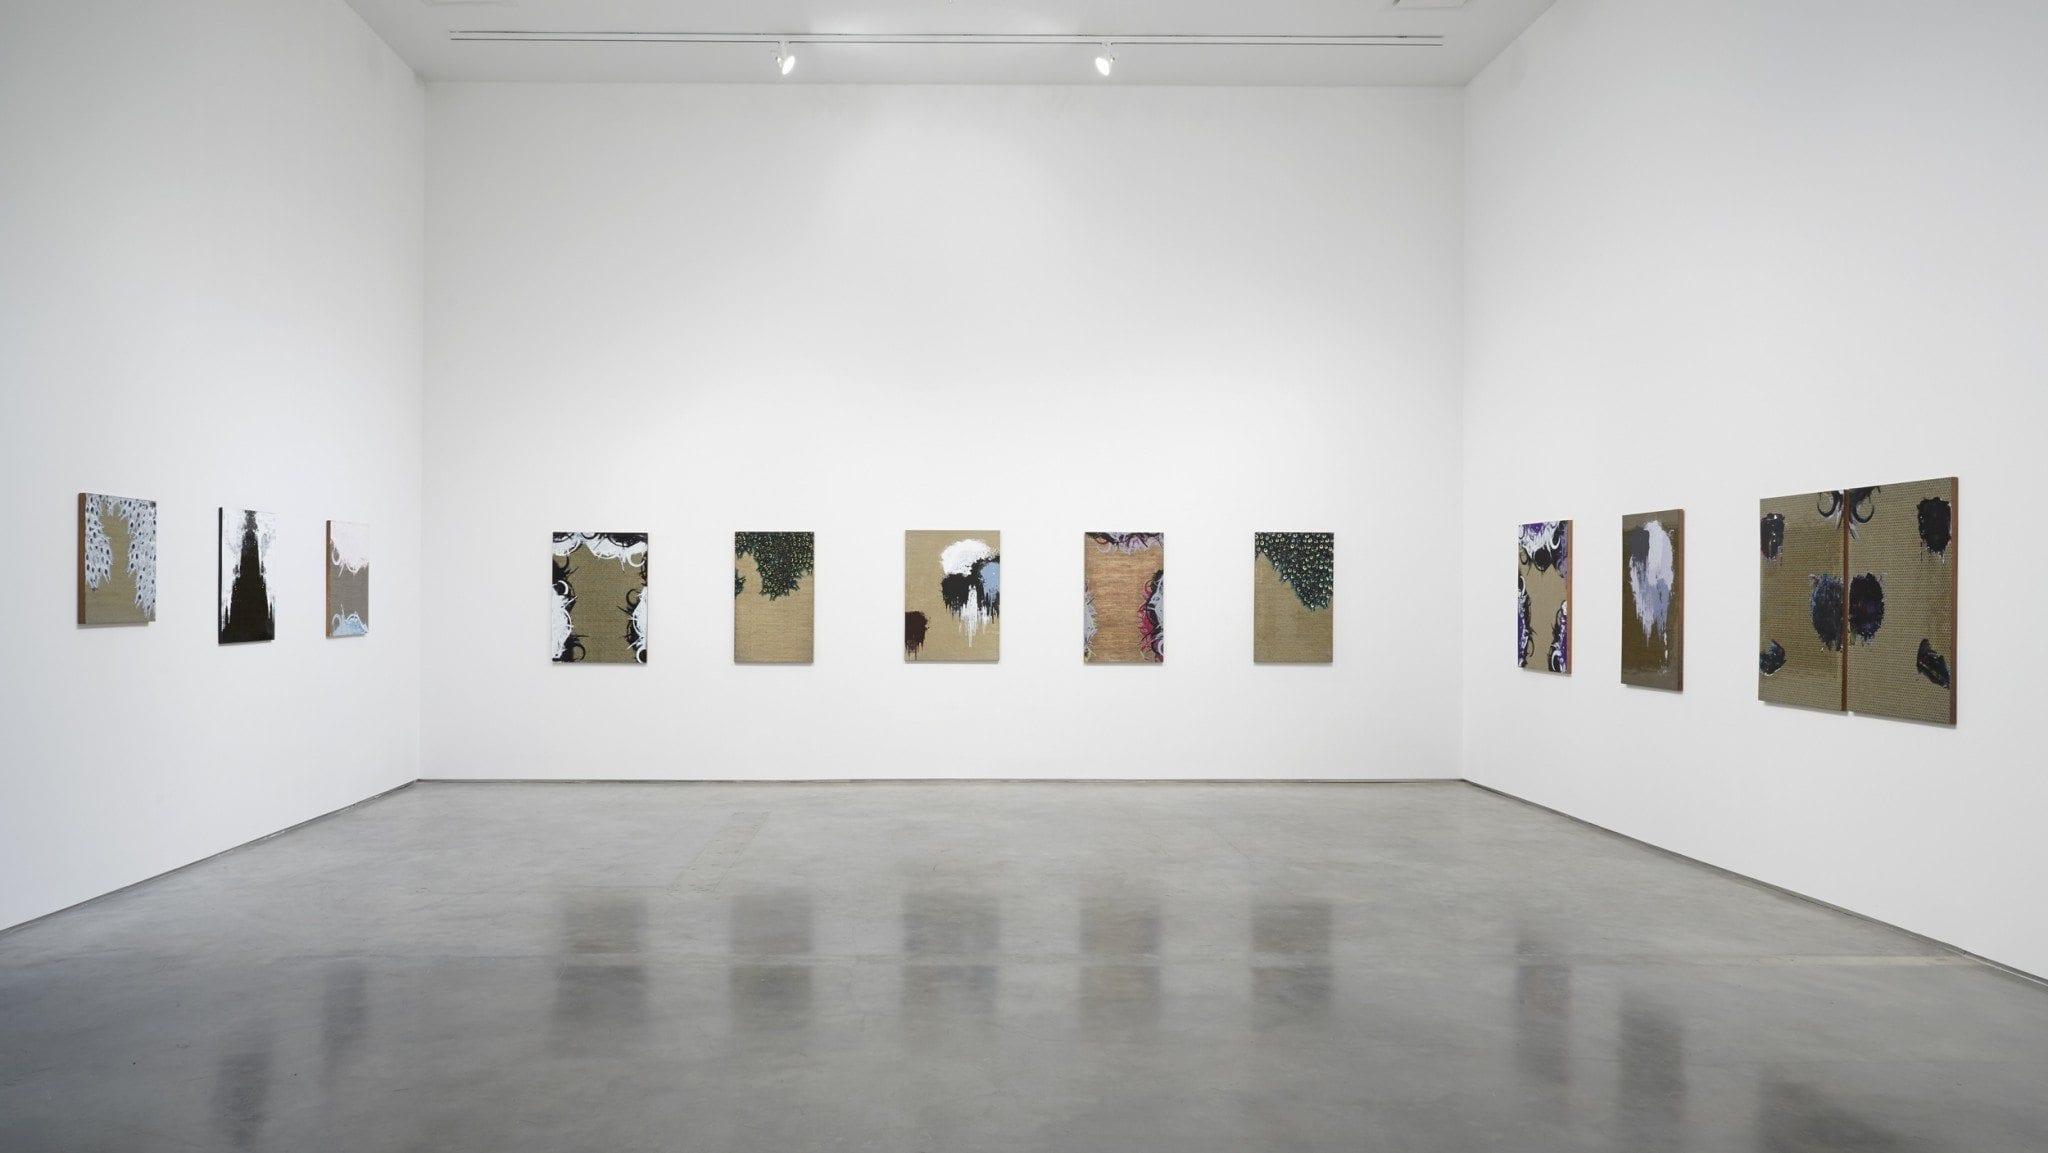 Andisheh-Avini-Marianne-Boesky-Gallery-8